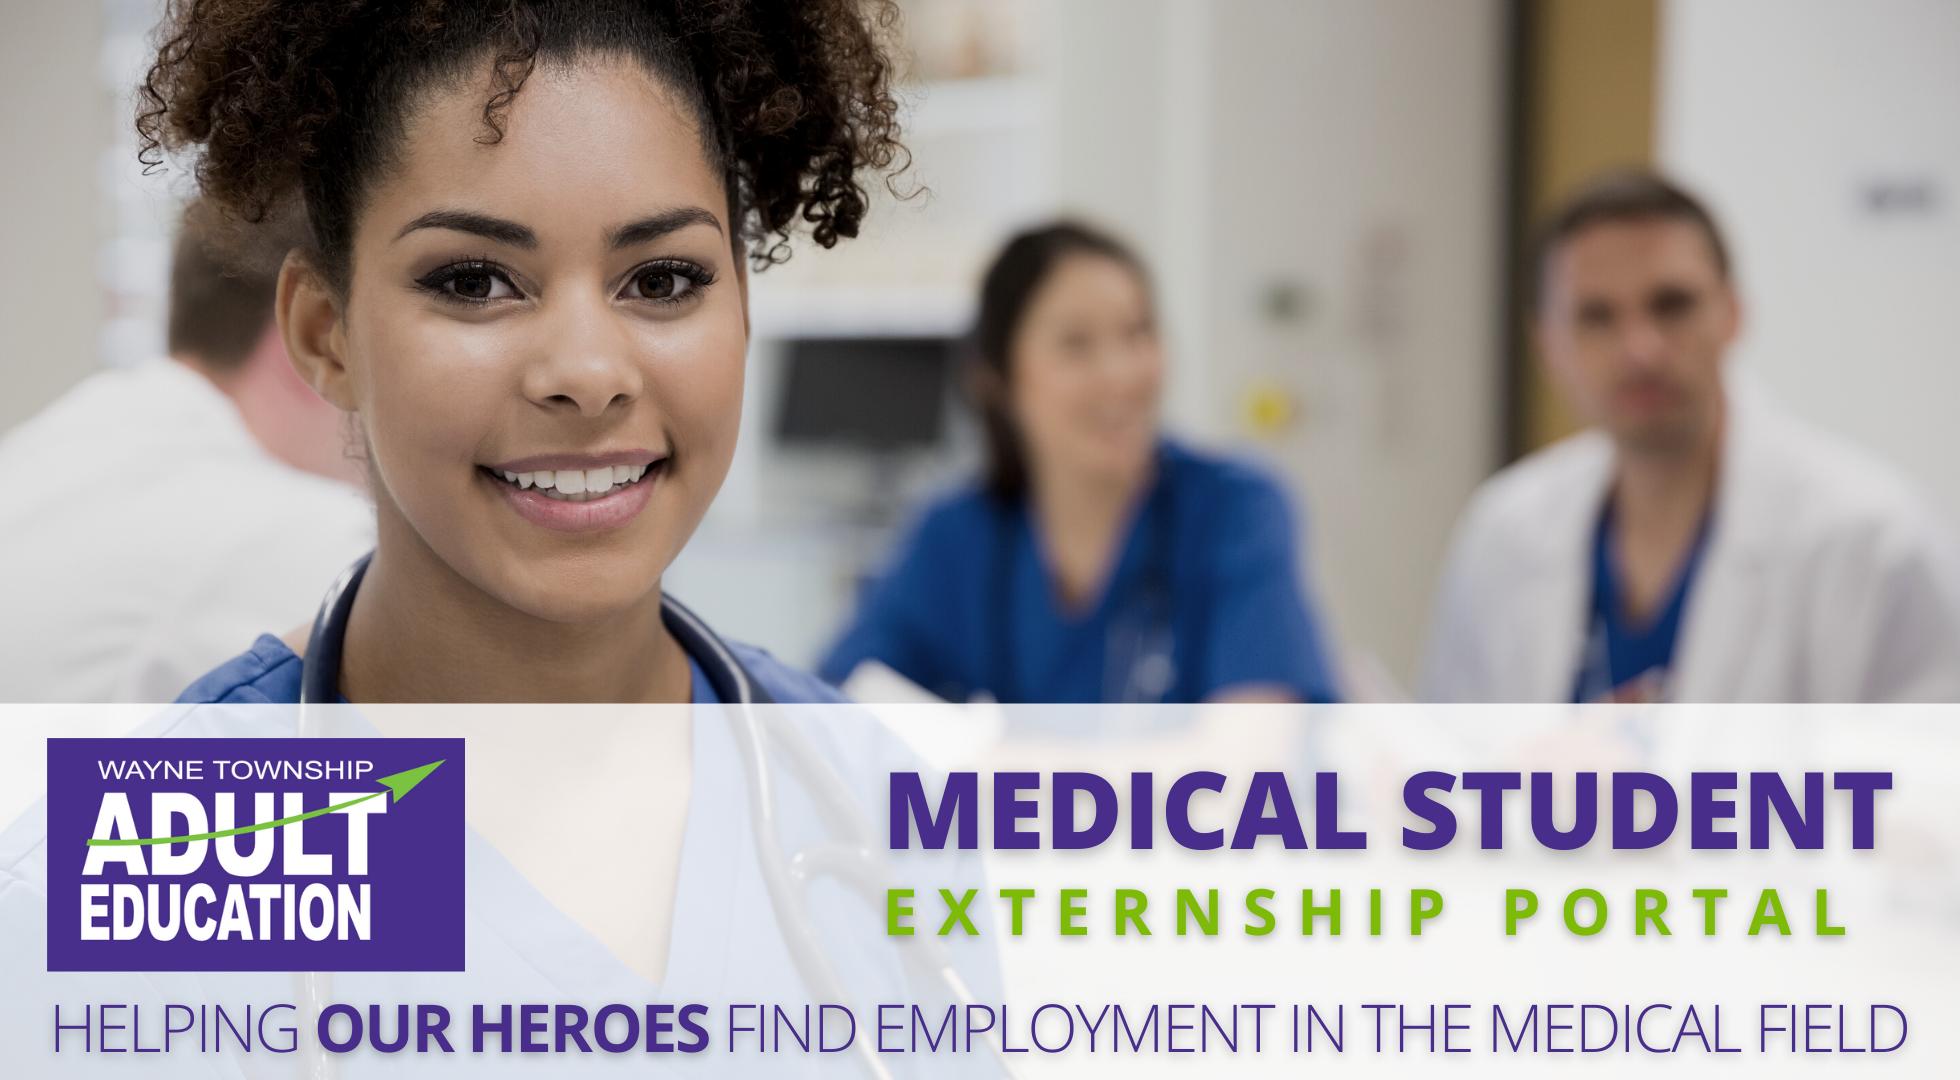 Medical Student Externship Portal